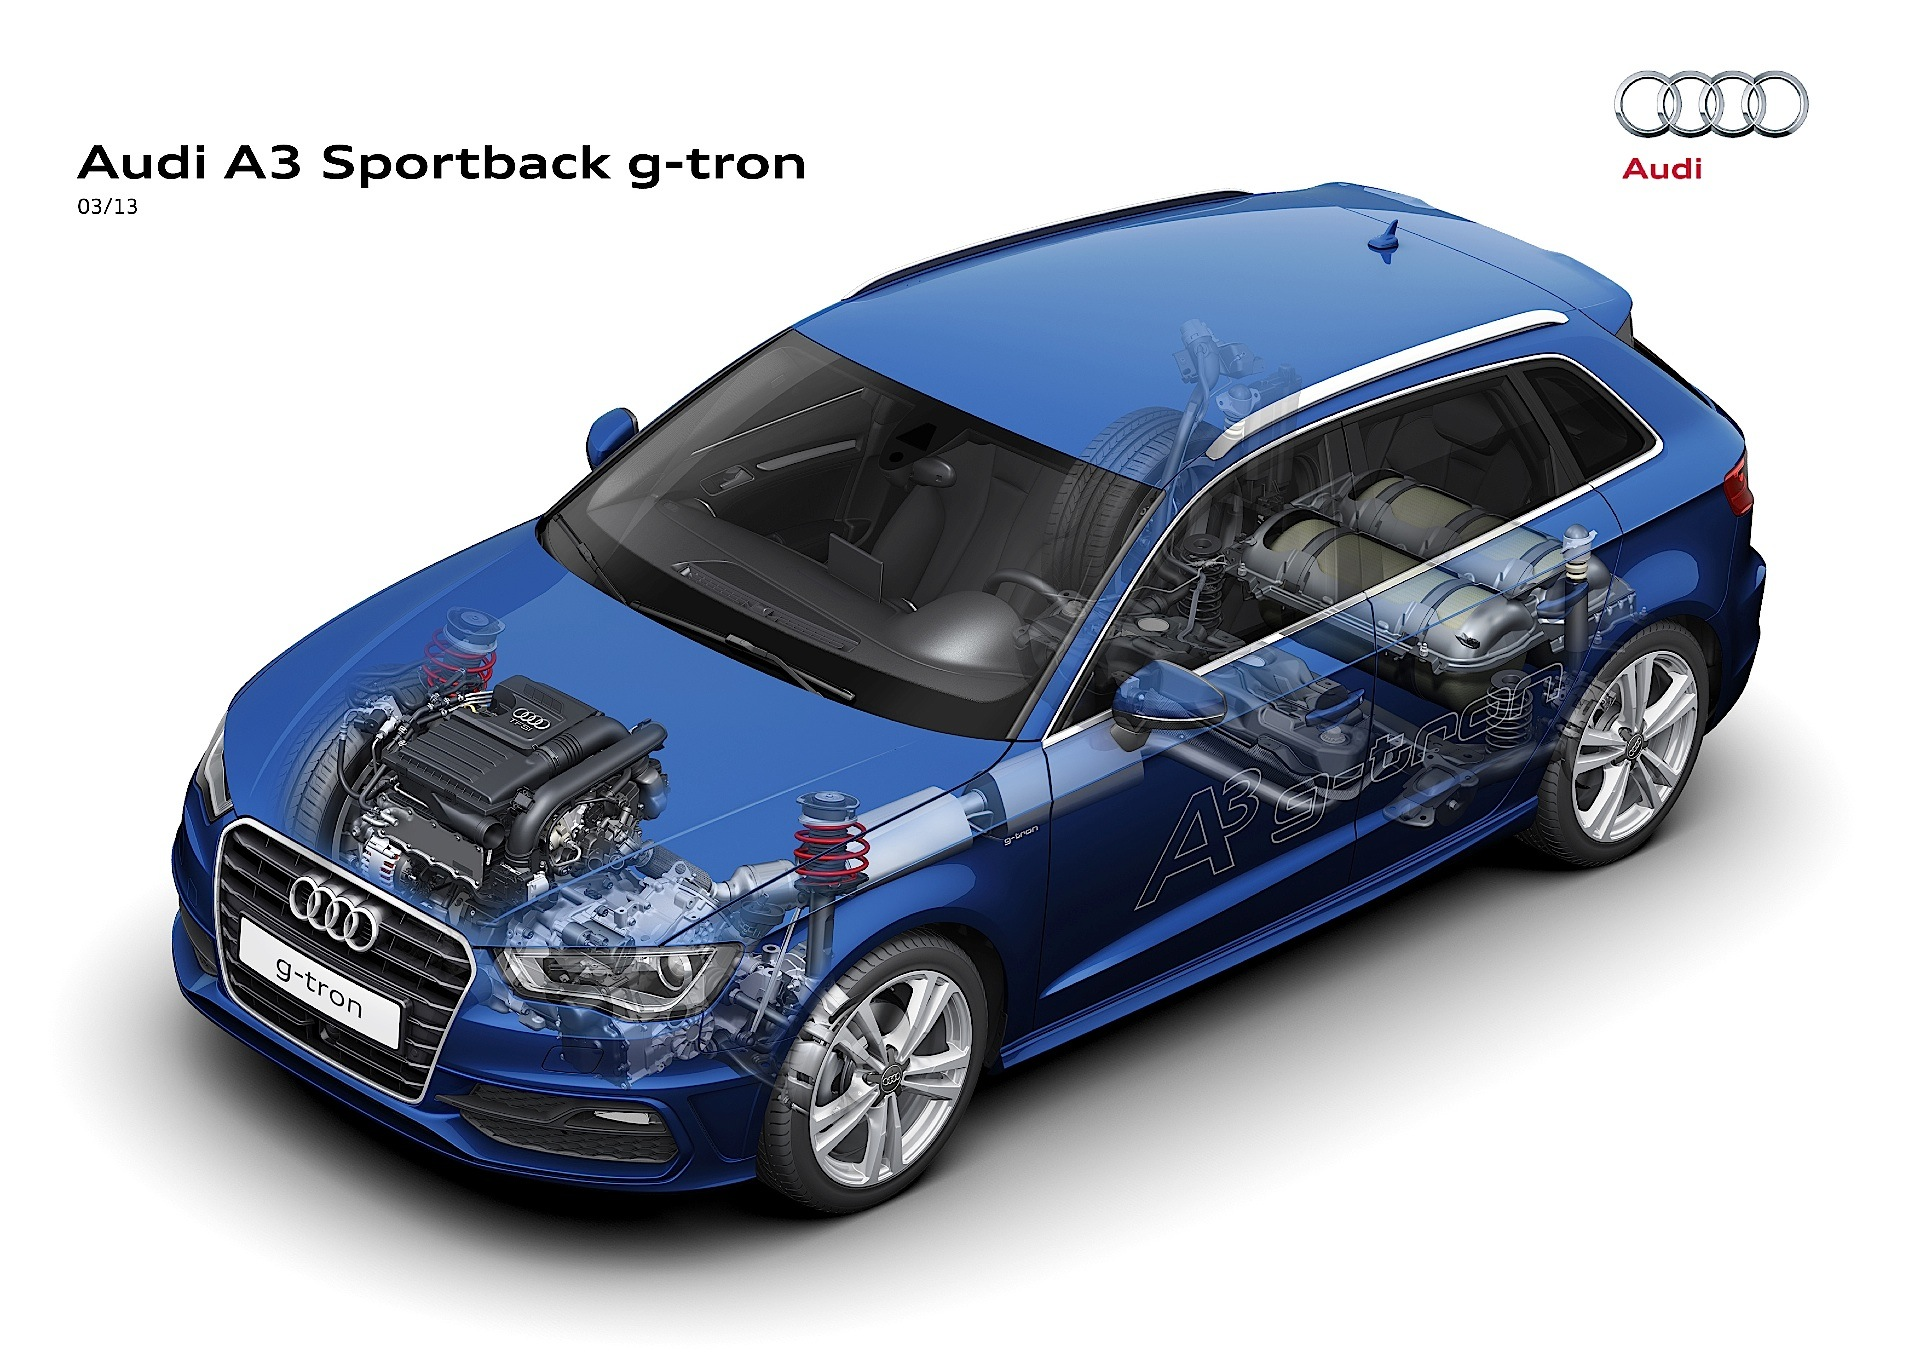 audi a3 sportback g tron 2013 2014 2015 2016 autoevolution. Black Bedroom Furniture Sets. Home Design Ideas